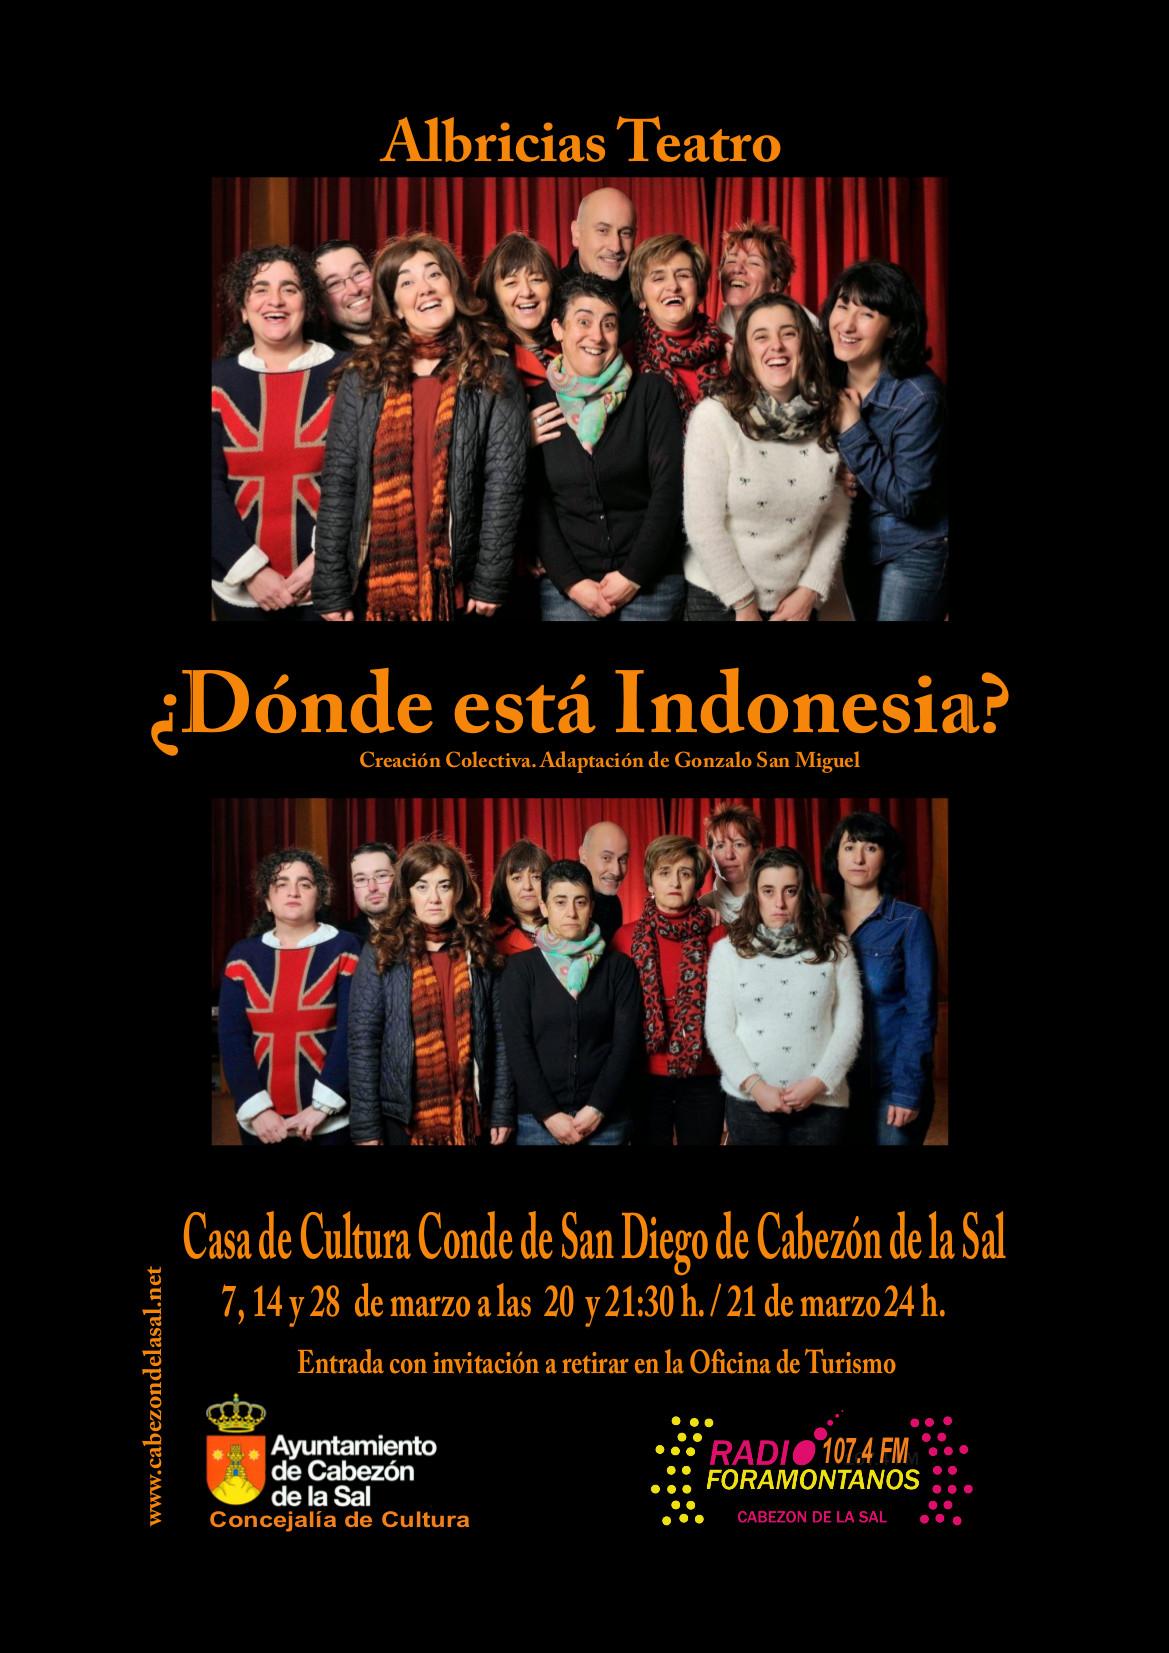 http://www.cabezondelasal.net/wp-content/uploads/2015/03/Albricias-teatro.jpg